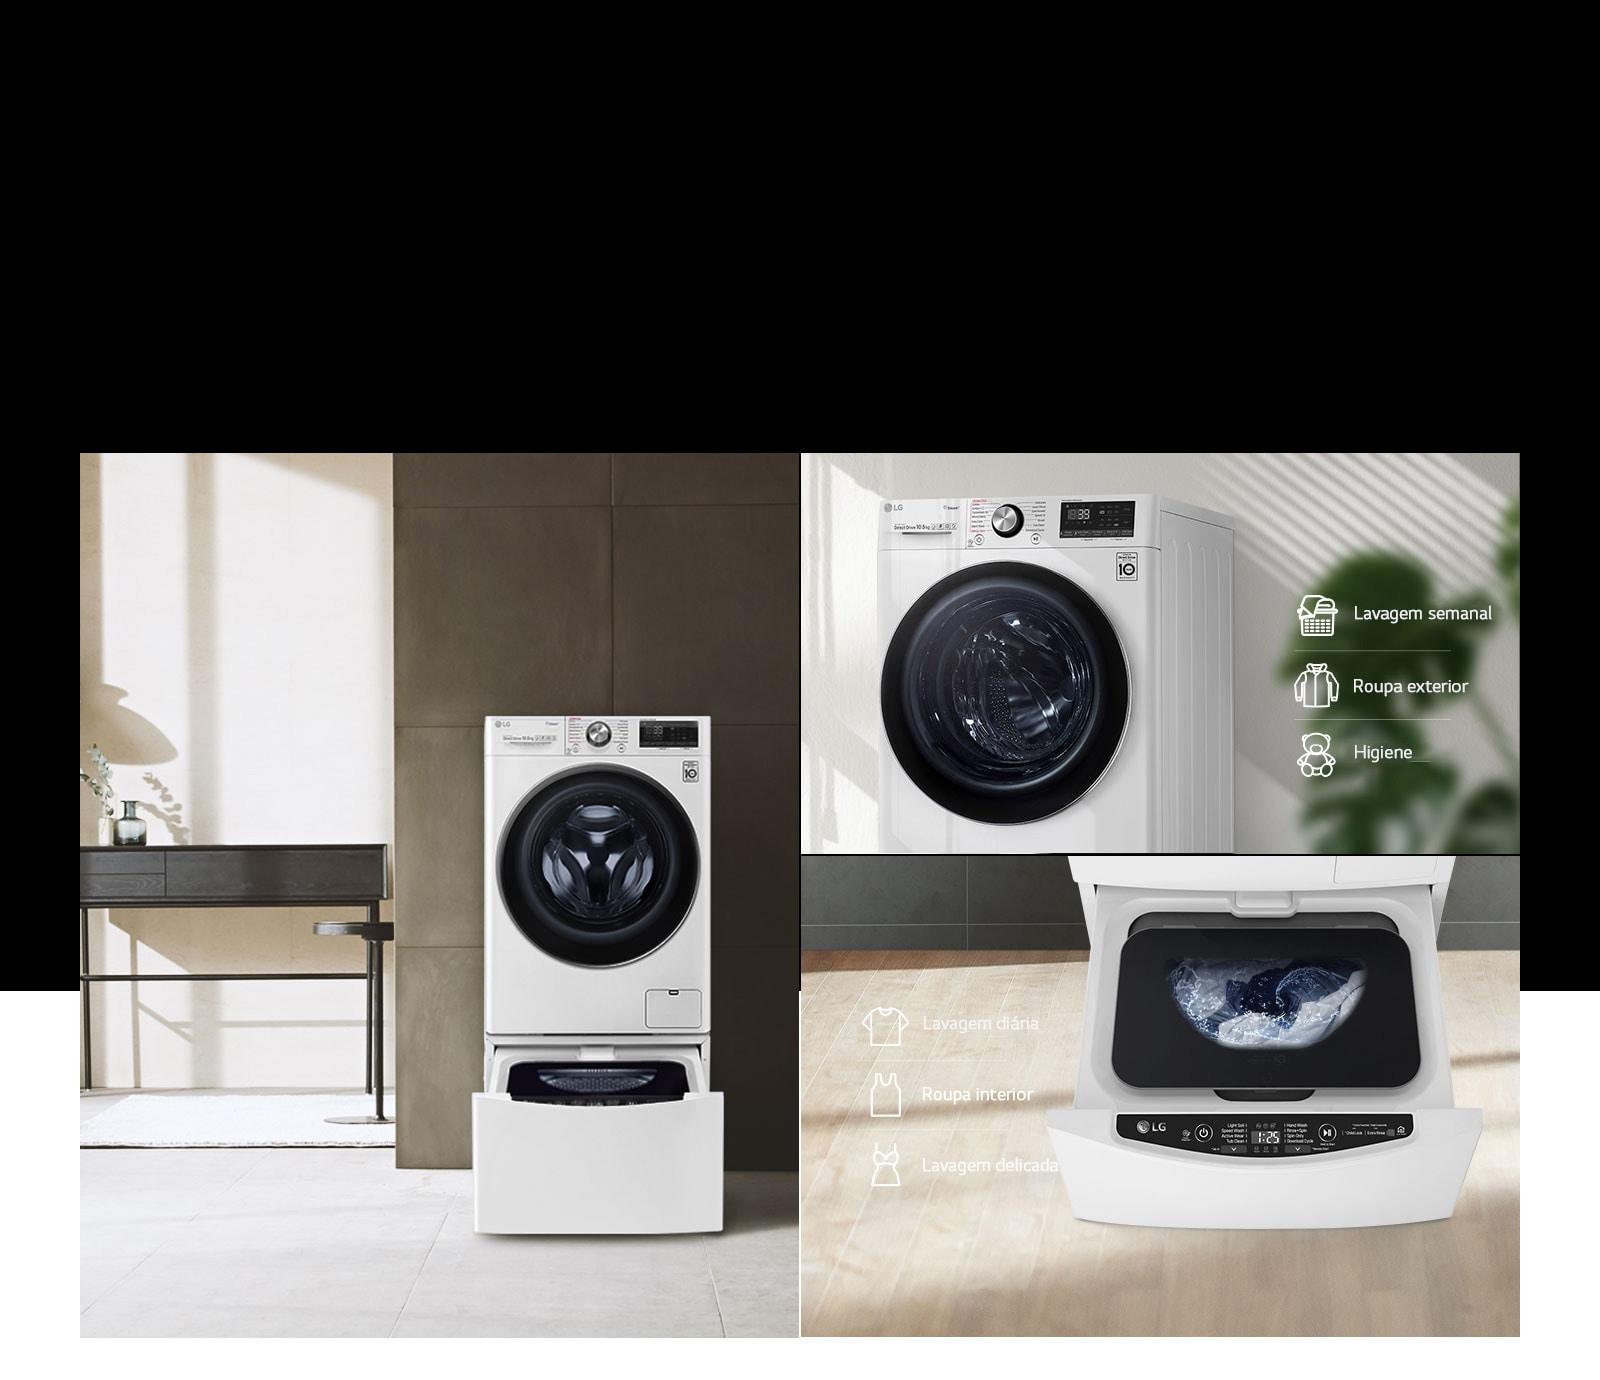 D13_WM-Vivace-V900-VC2-White-12-1-Compatibility-Desktop_vv